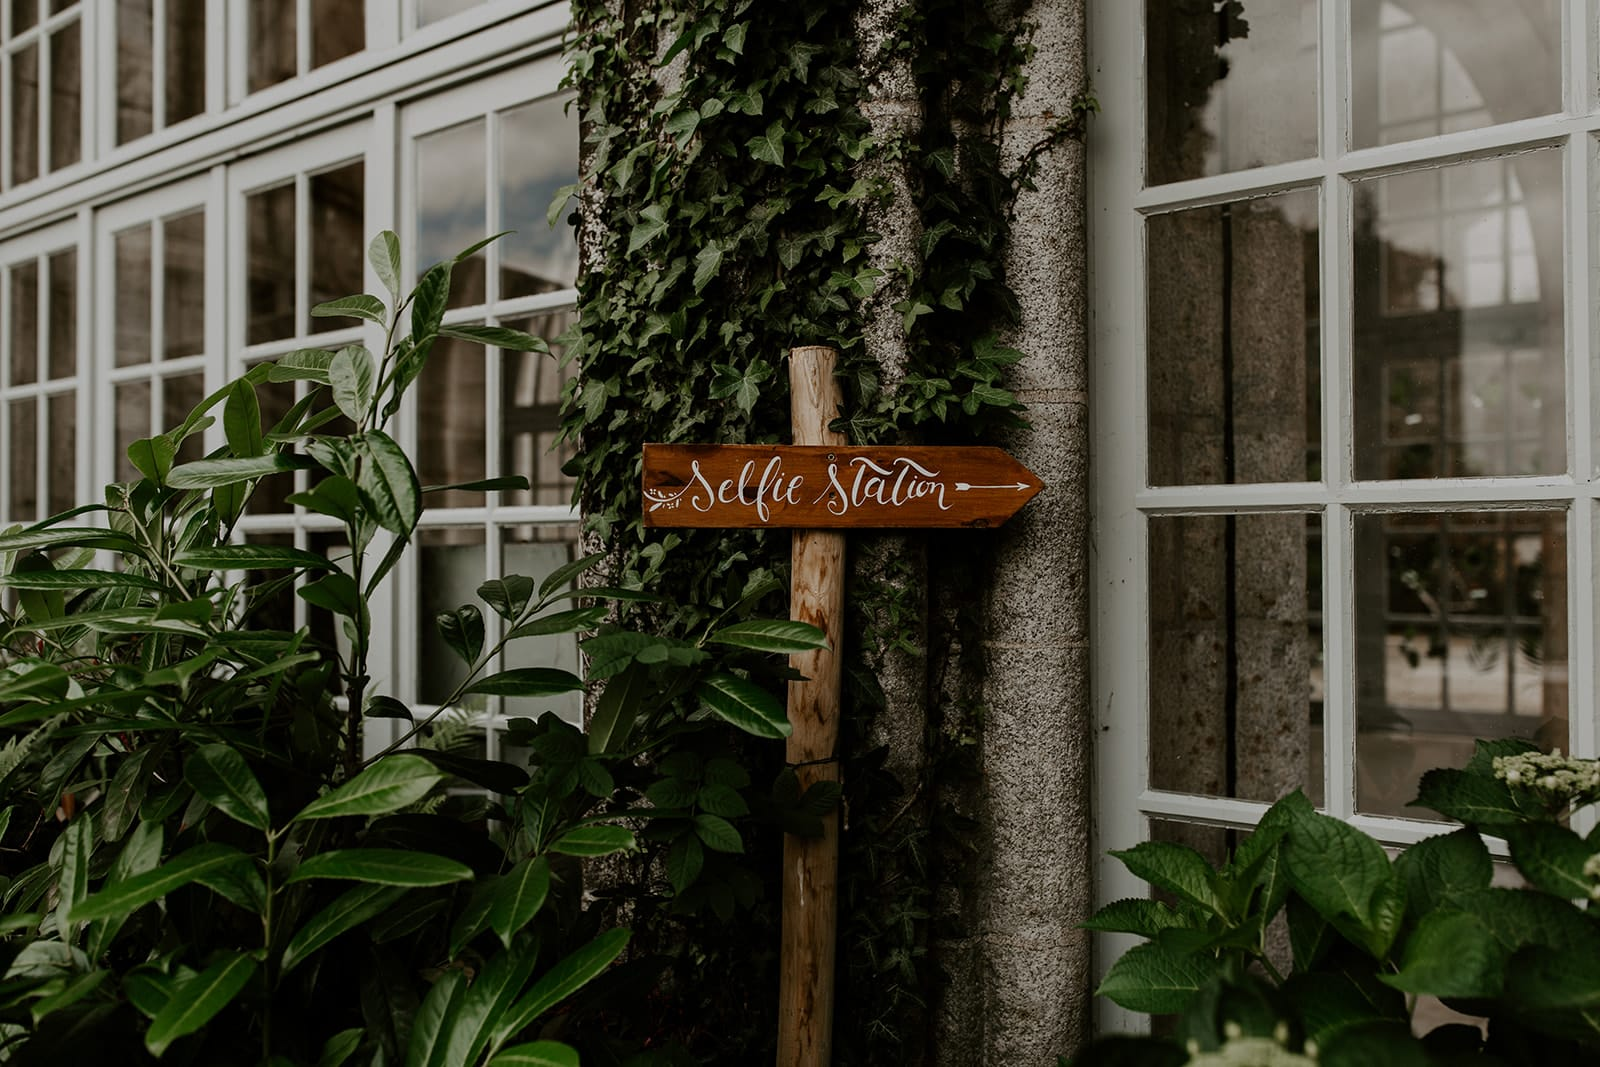 mariage_chateau_la_flocelliere_vendee_flavie_nelly_photographe-160-obonheurdesdames-decoration-mariage-location-vegetal